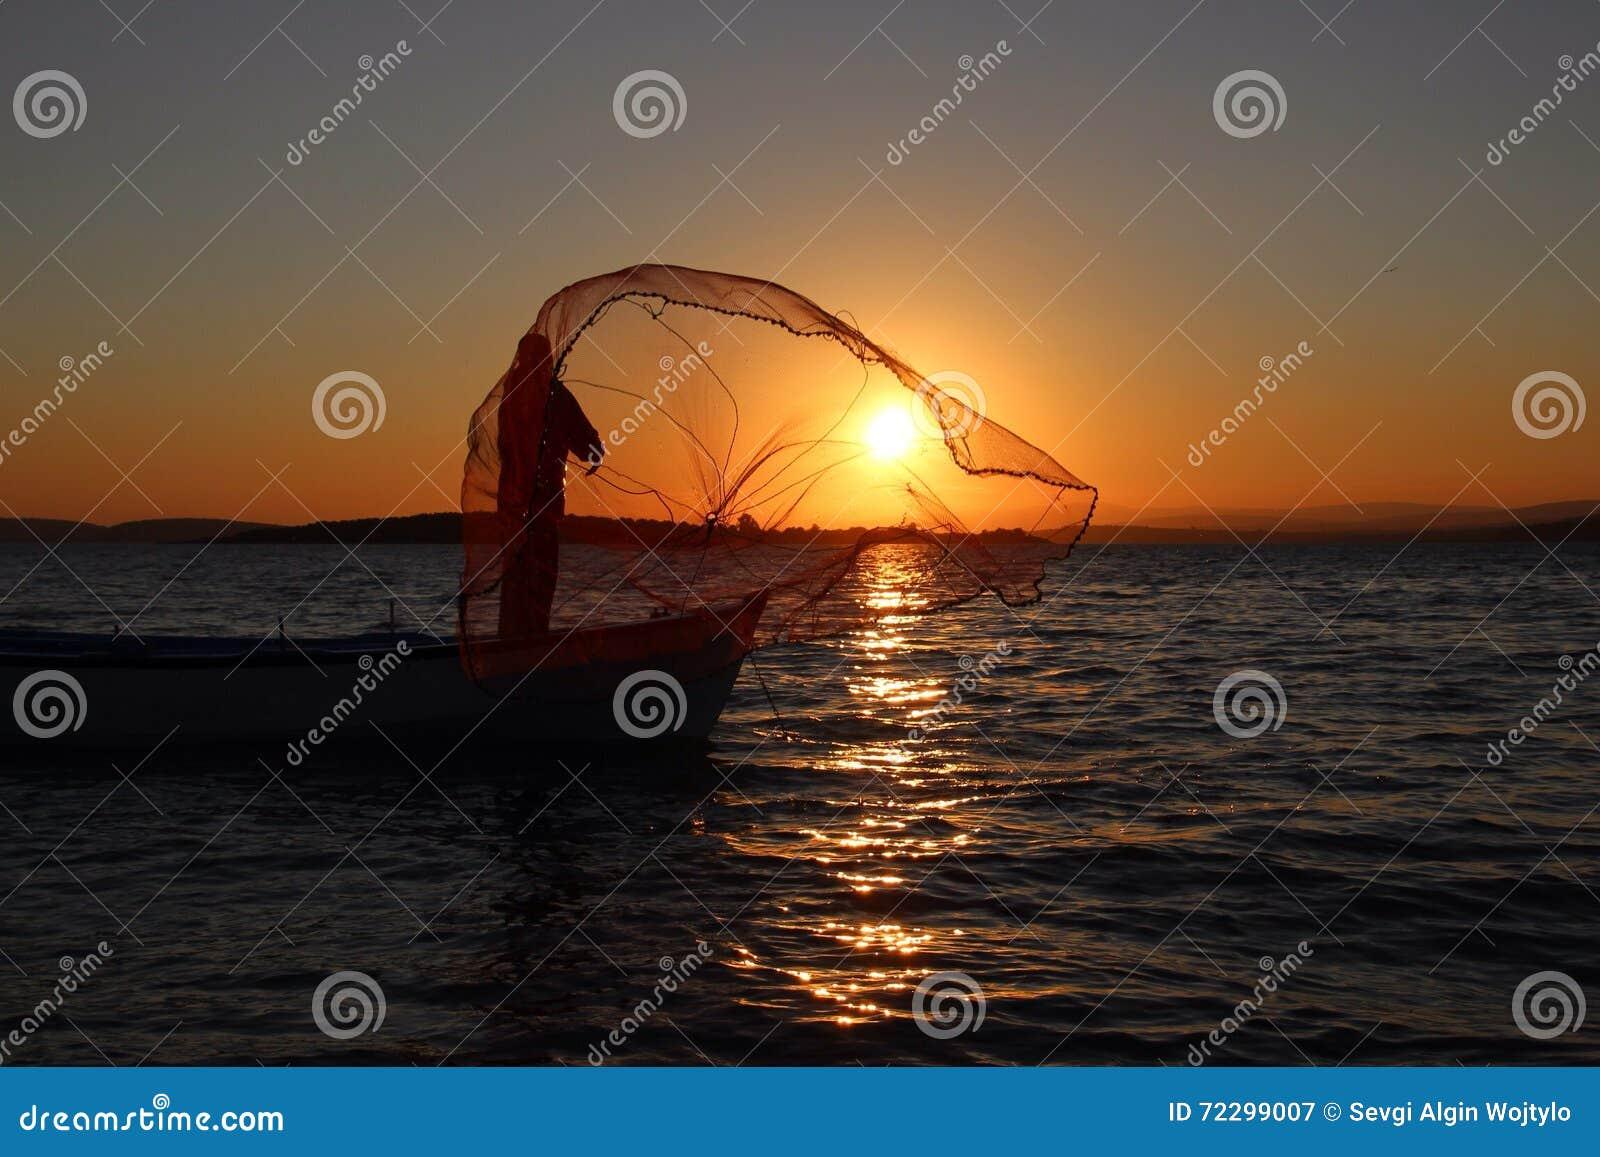 Download Рыболов и заход солнца стоковое изображение. изображение насчитывающей еда - 72299007